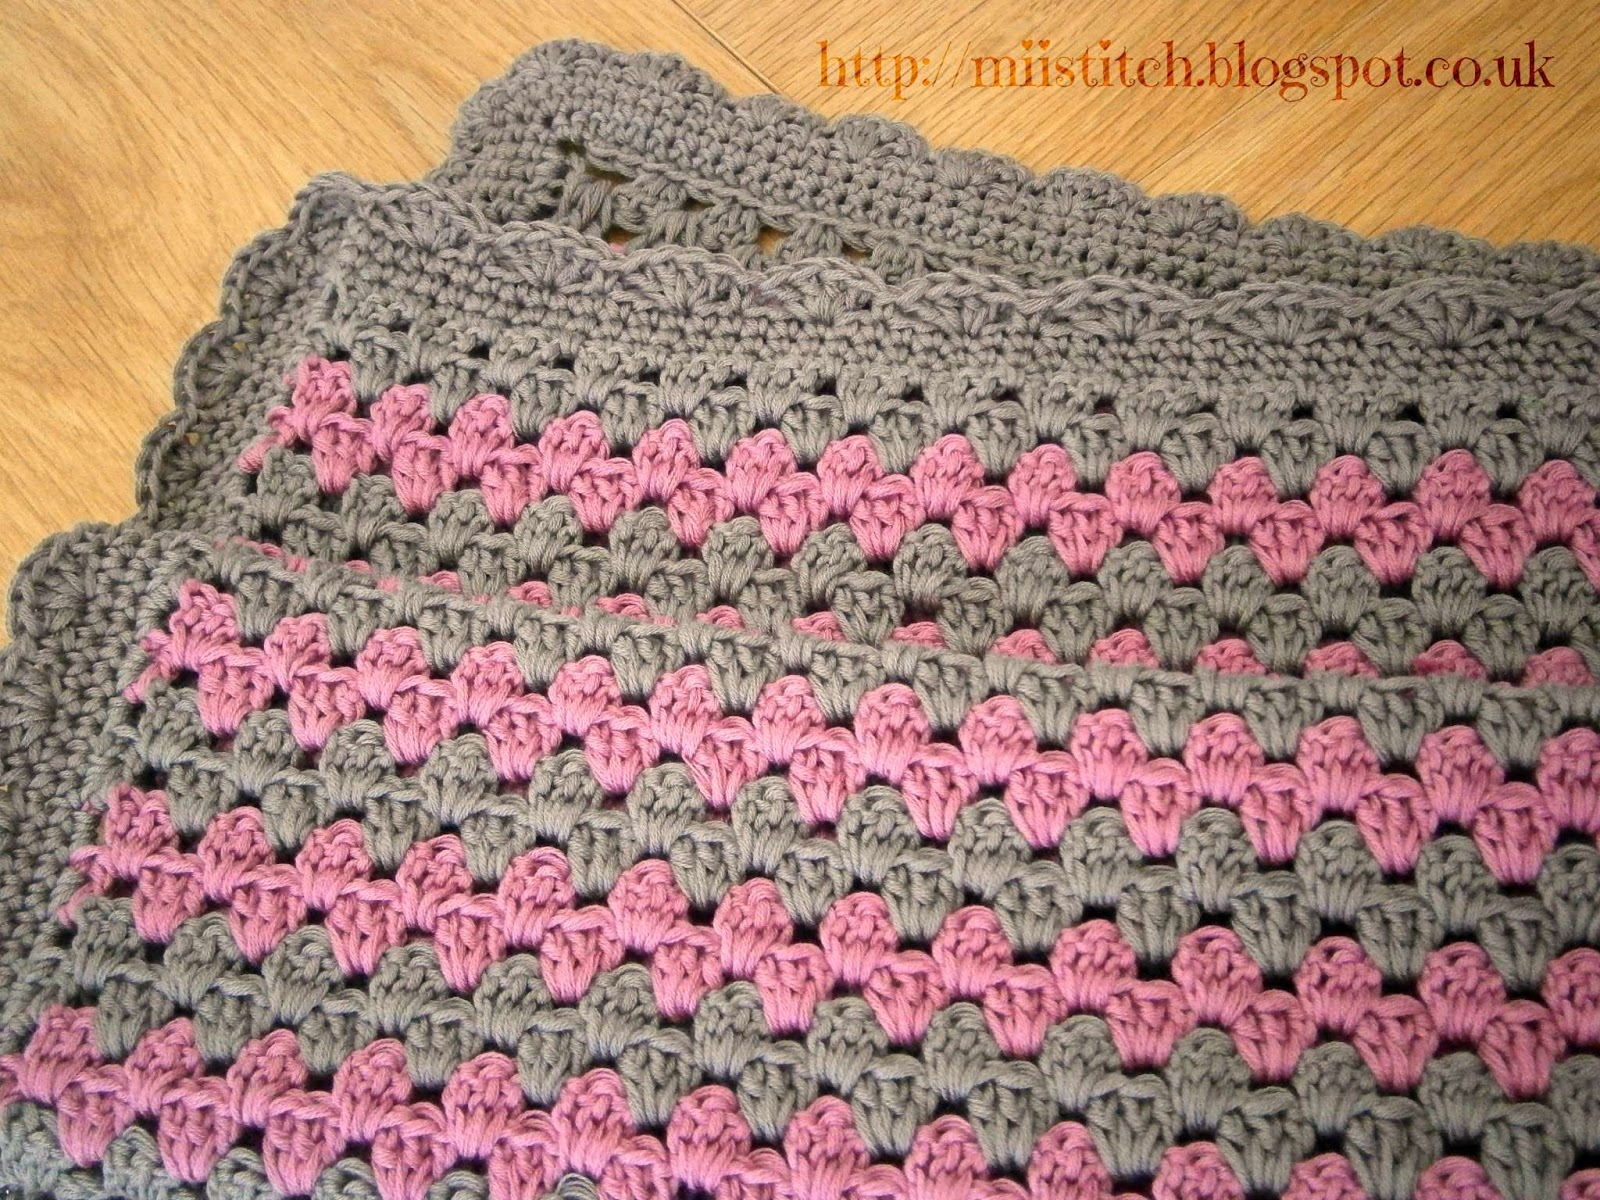 Crochet Granny Stripe Baby Blanket Pattern : Mii Stitch: Granny Stripe Baby Blanket - Maybe Matilda